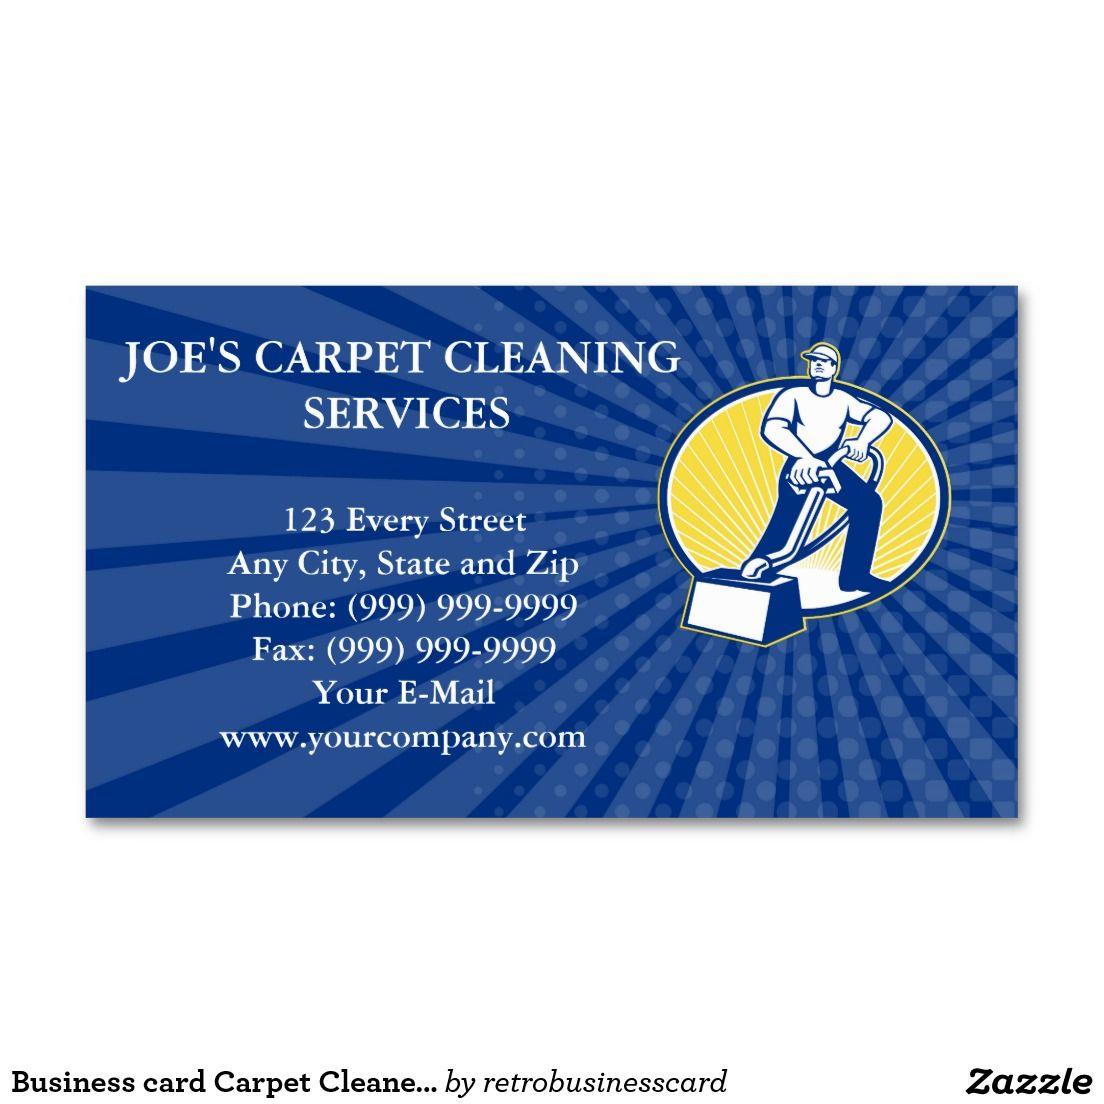 Business card carpet cleaner vacuum cleaning machi